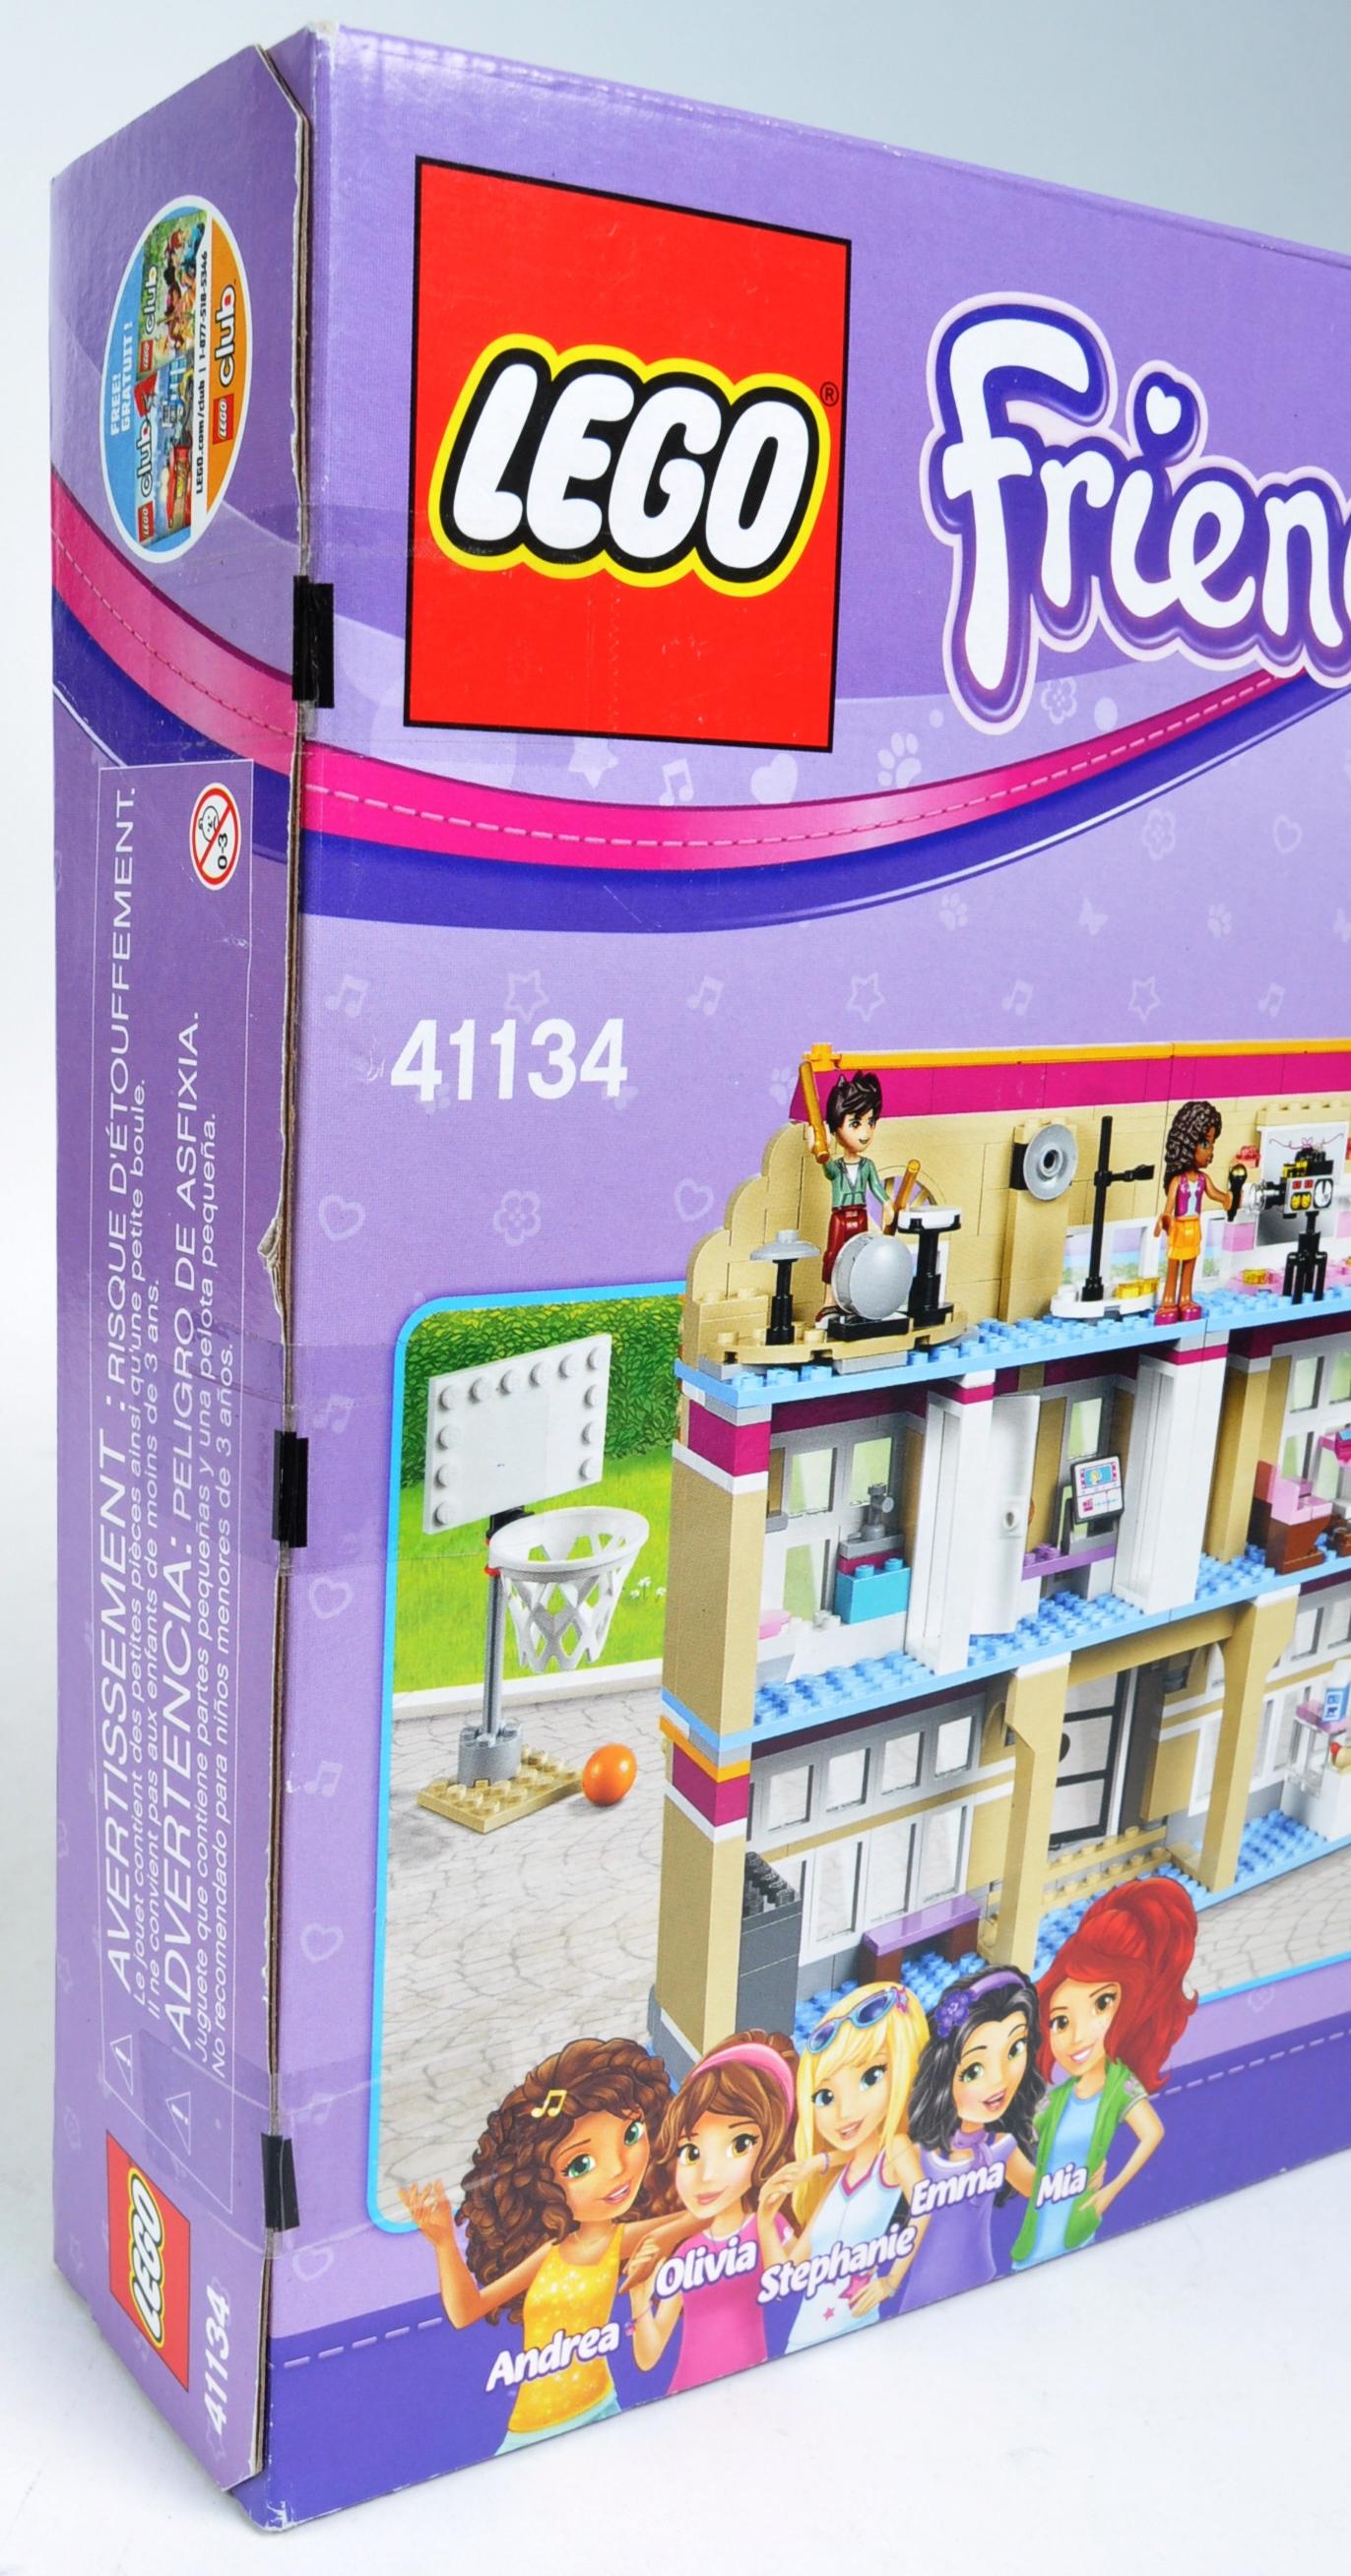 LEGO SET - LEGO FRIENDS - 41134 - HEARTLAKE PERFORMANCE SCHOOL - Image 4 of 4